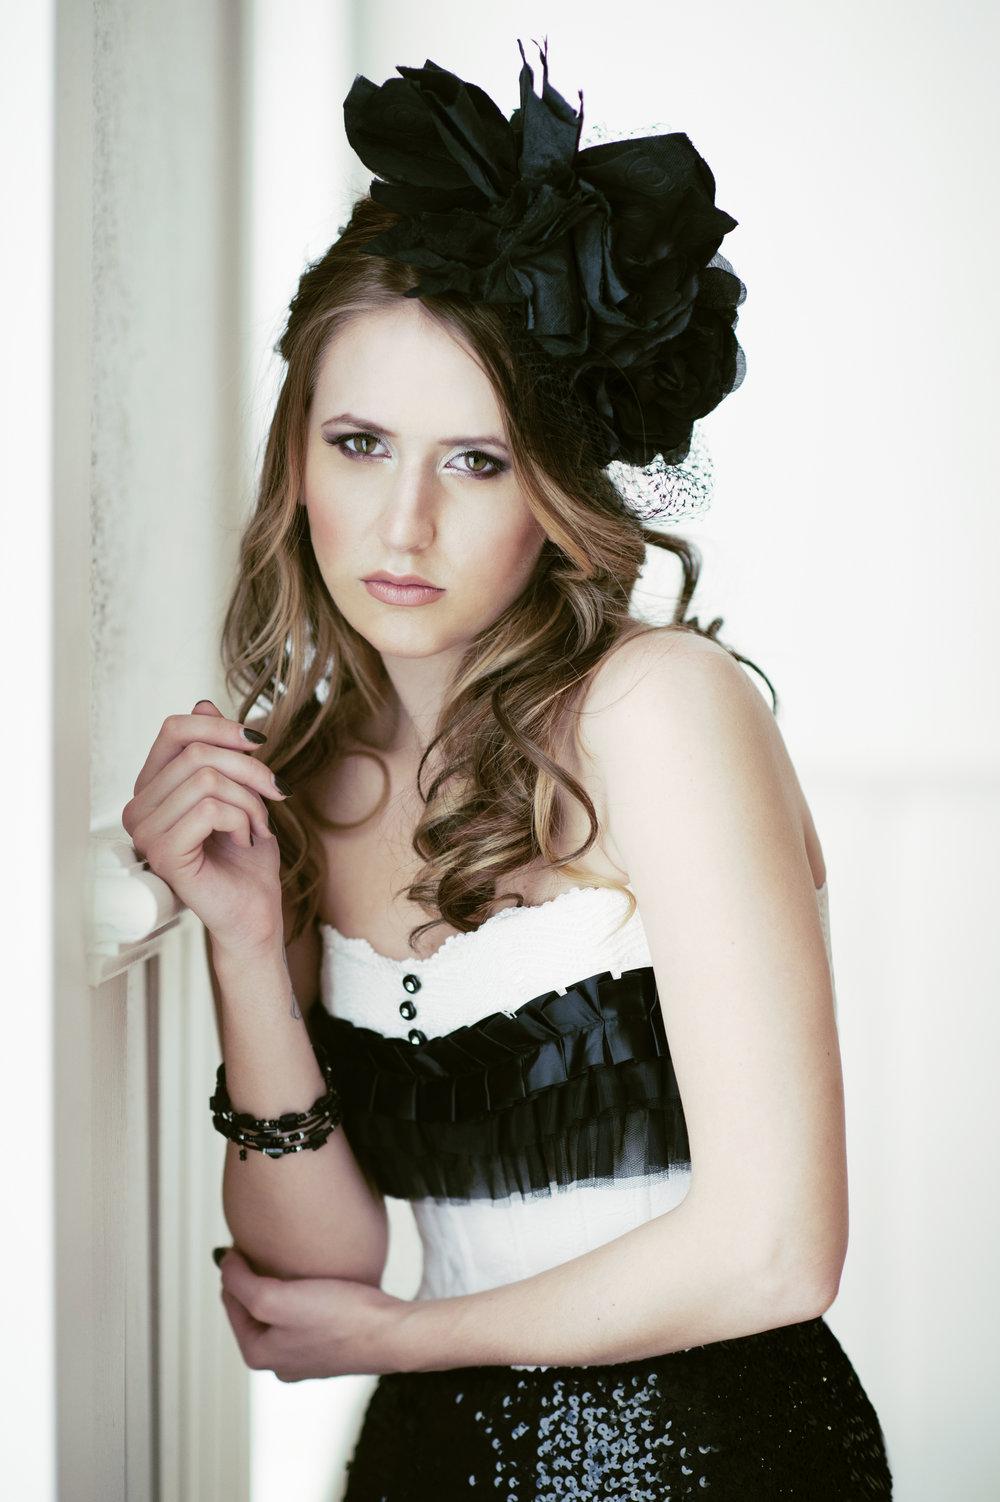 Marta-Hewson-Themed-portrait-Kristina-Jovanovic-resting-against-wall.jpg